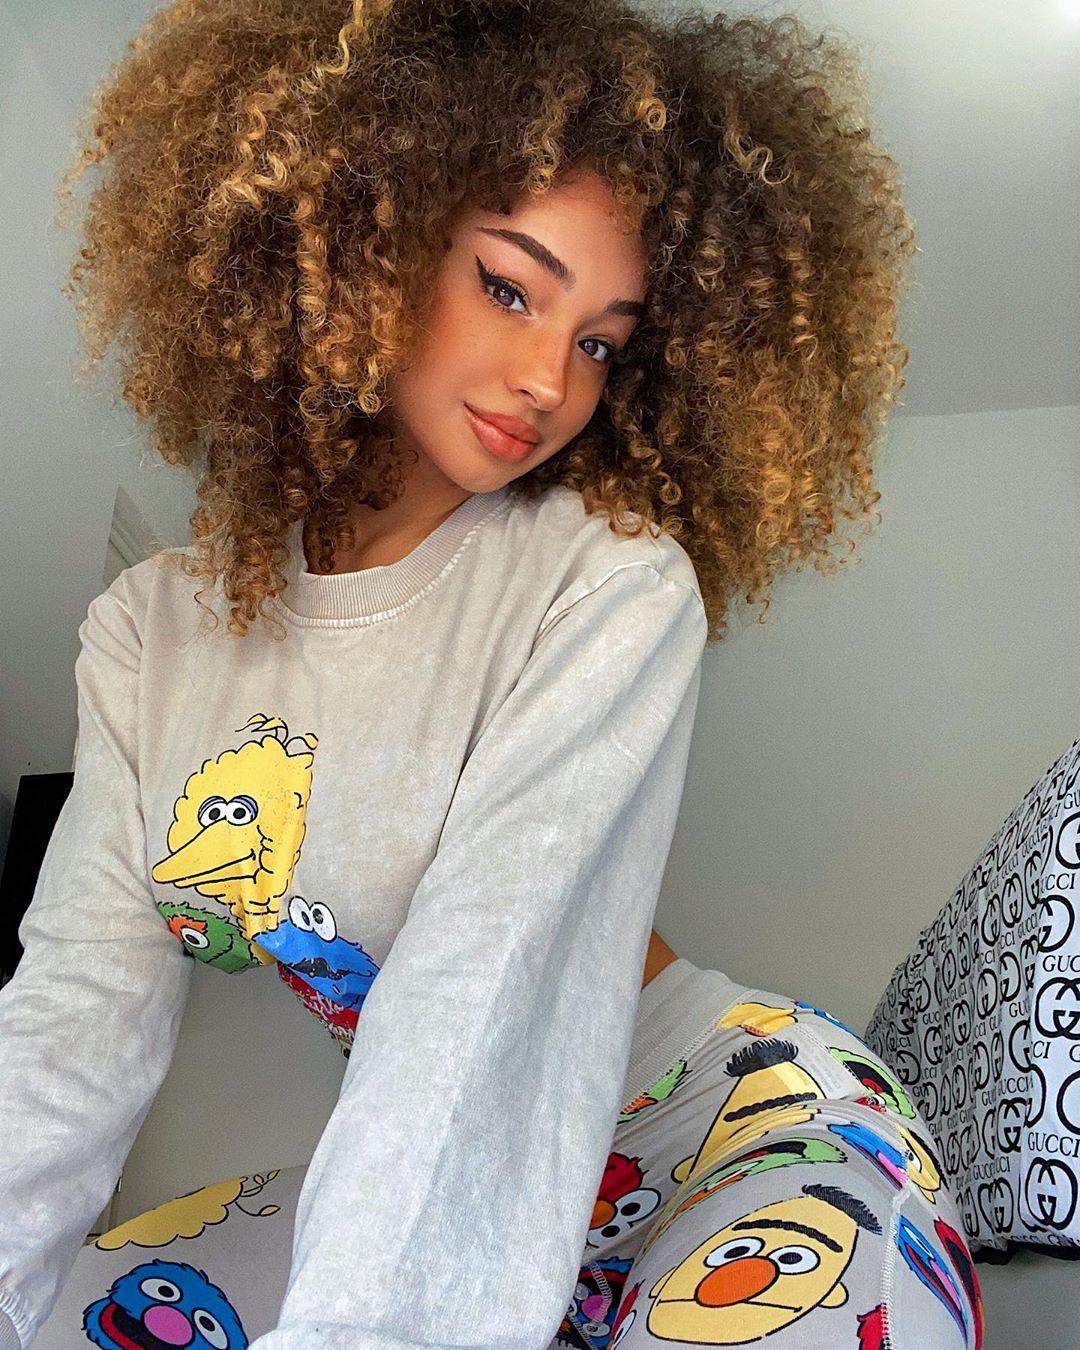 Dana-Curly-Wallpapers-Insta-Fit-Bio-1